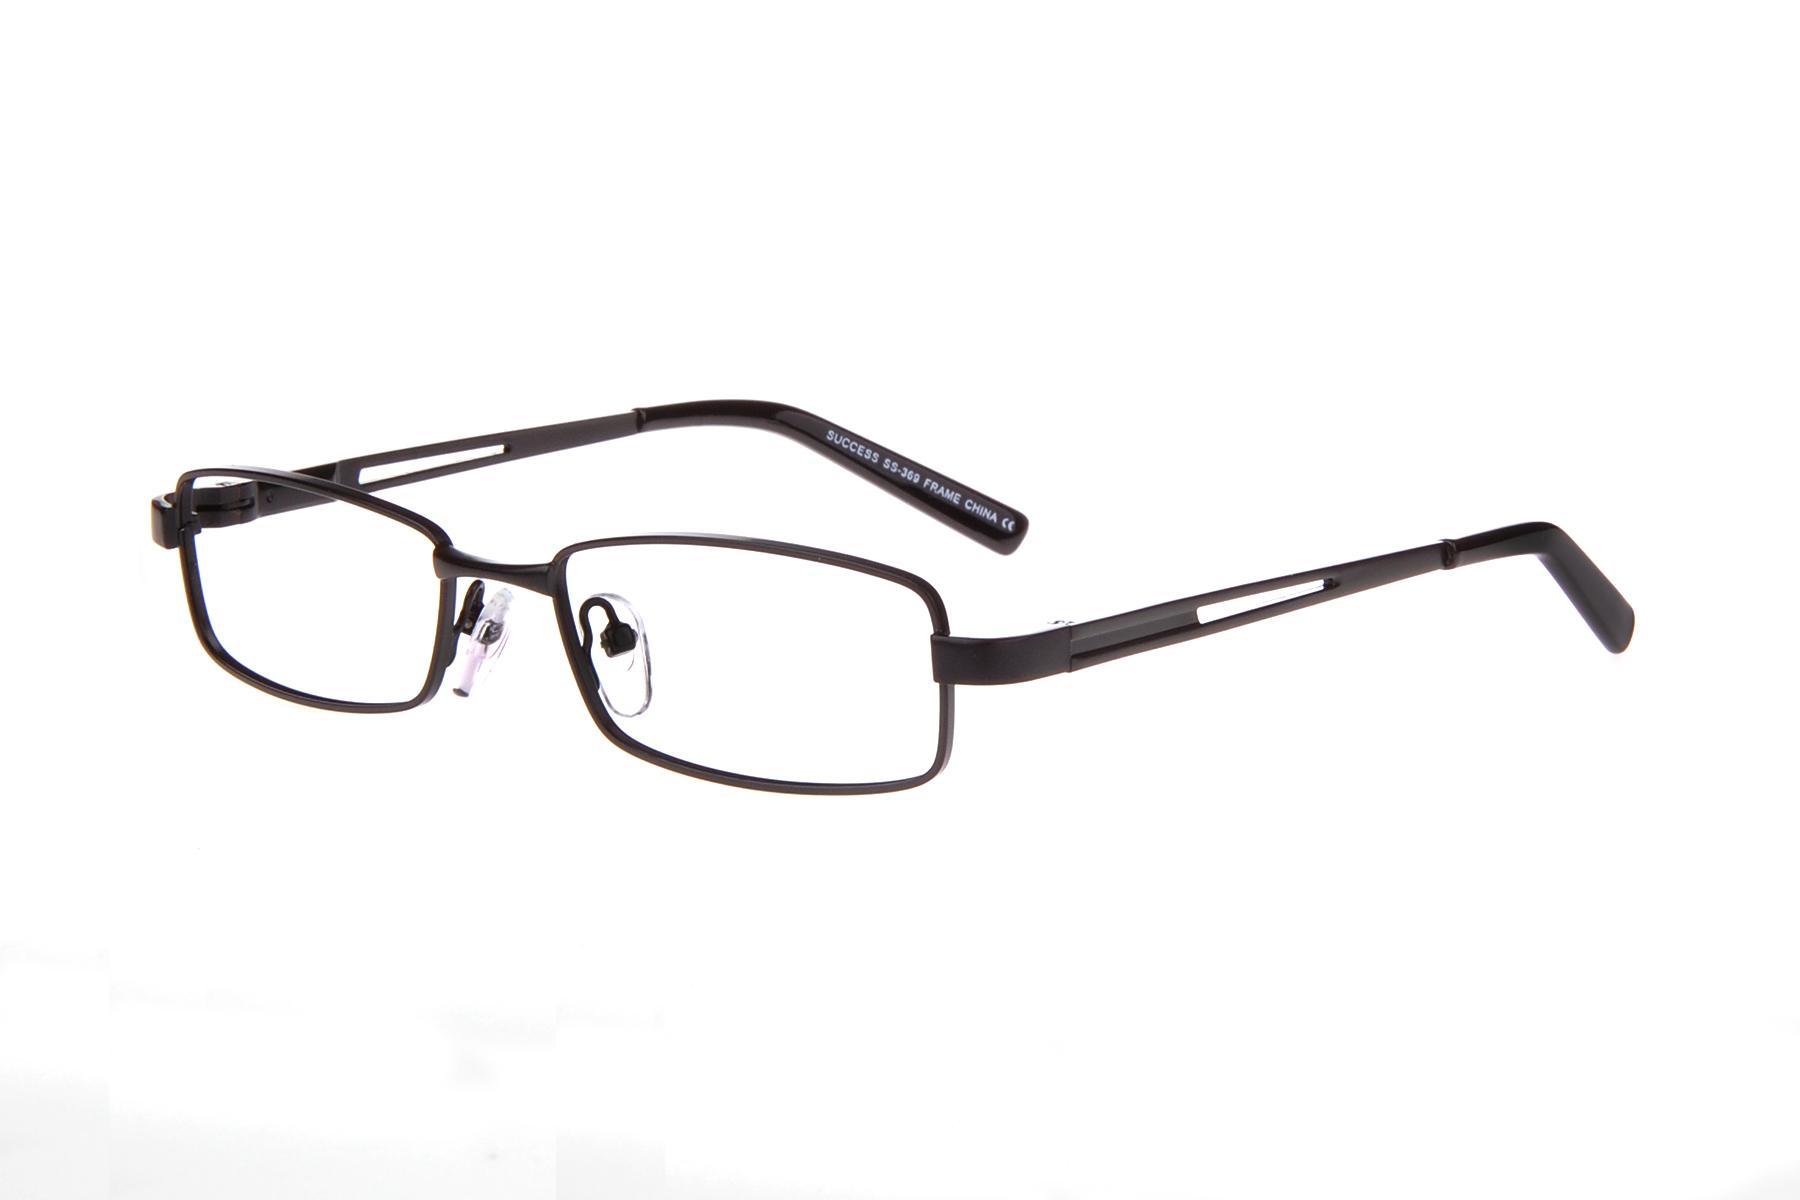 498f3eecd1b Success SS 369-SpecsToGo-Eyeglasses and Sunglasses